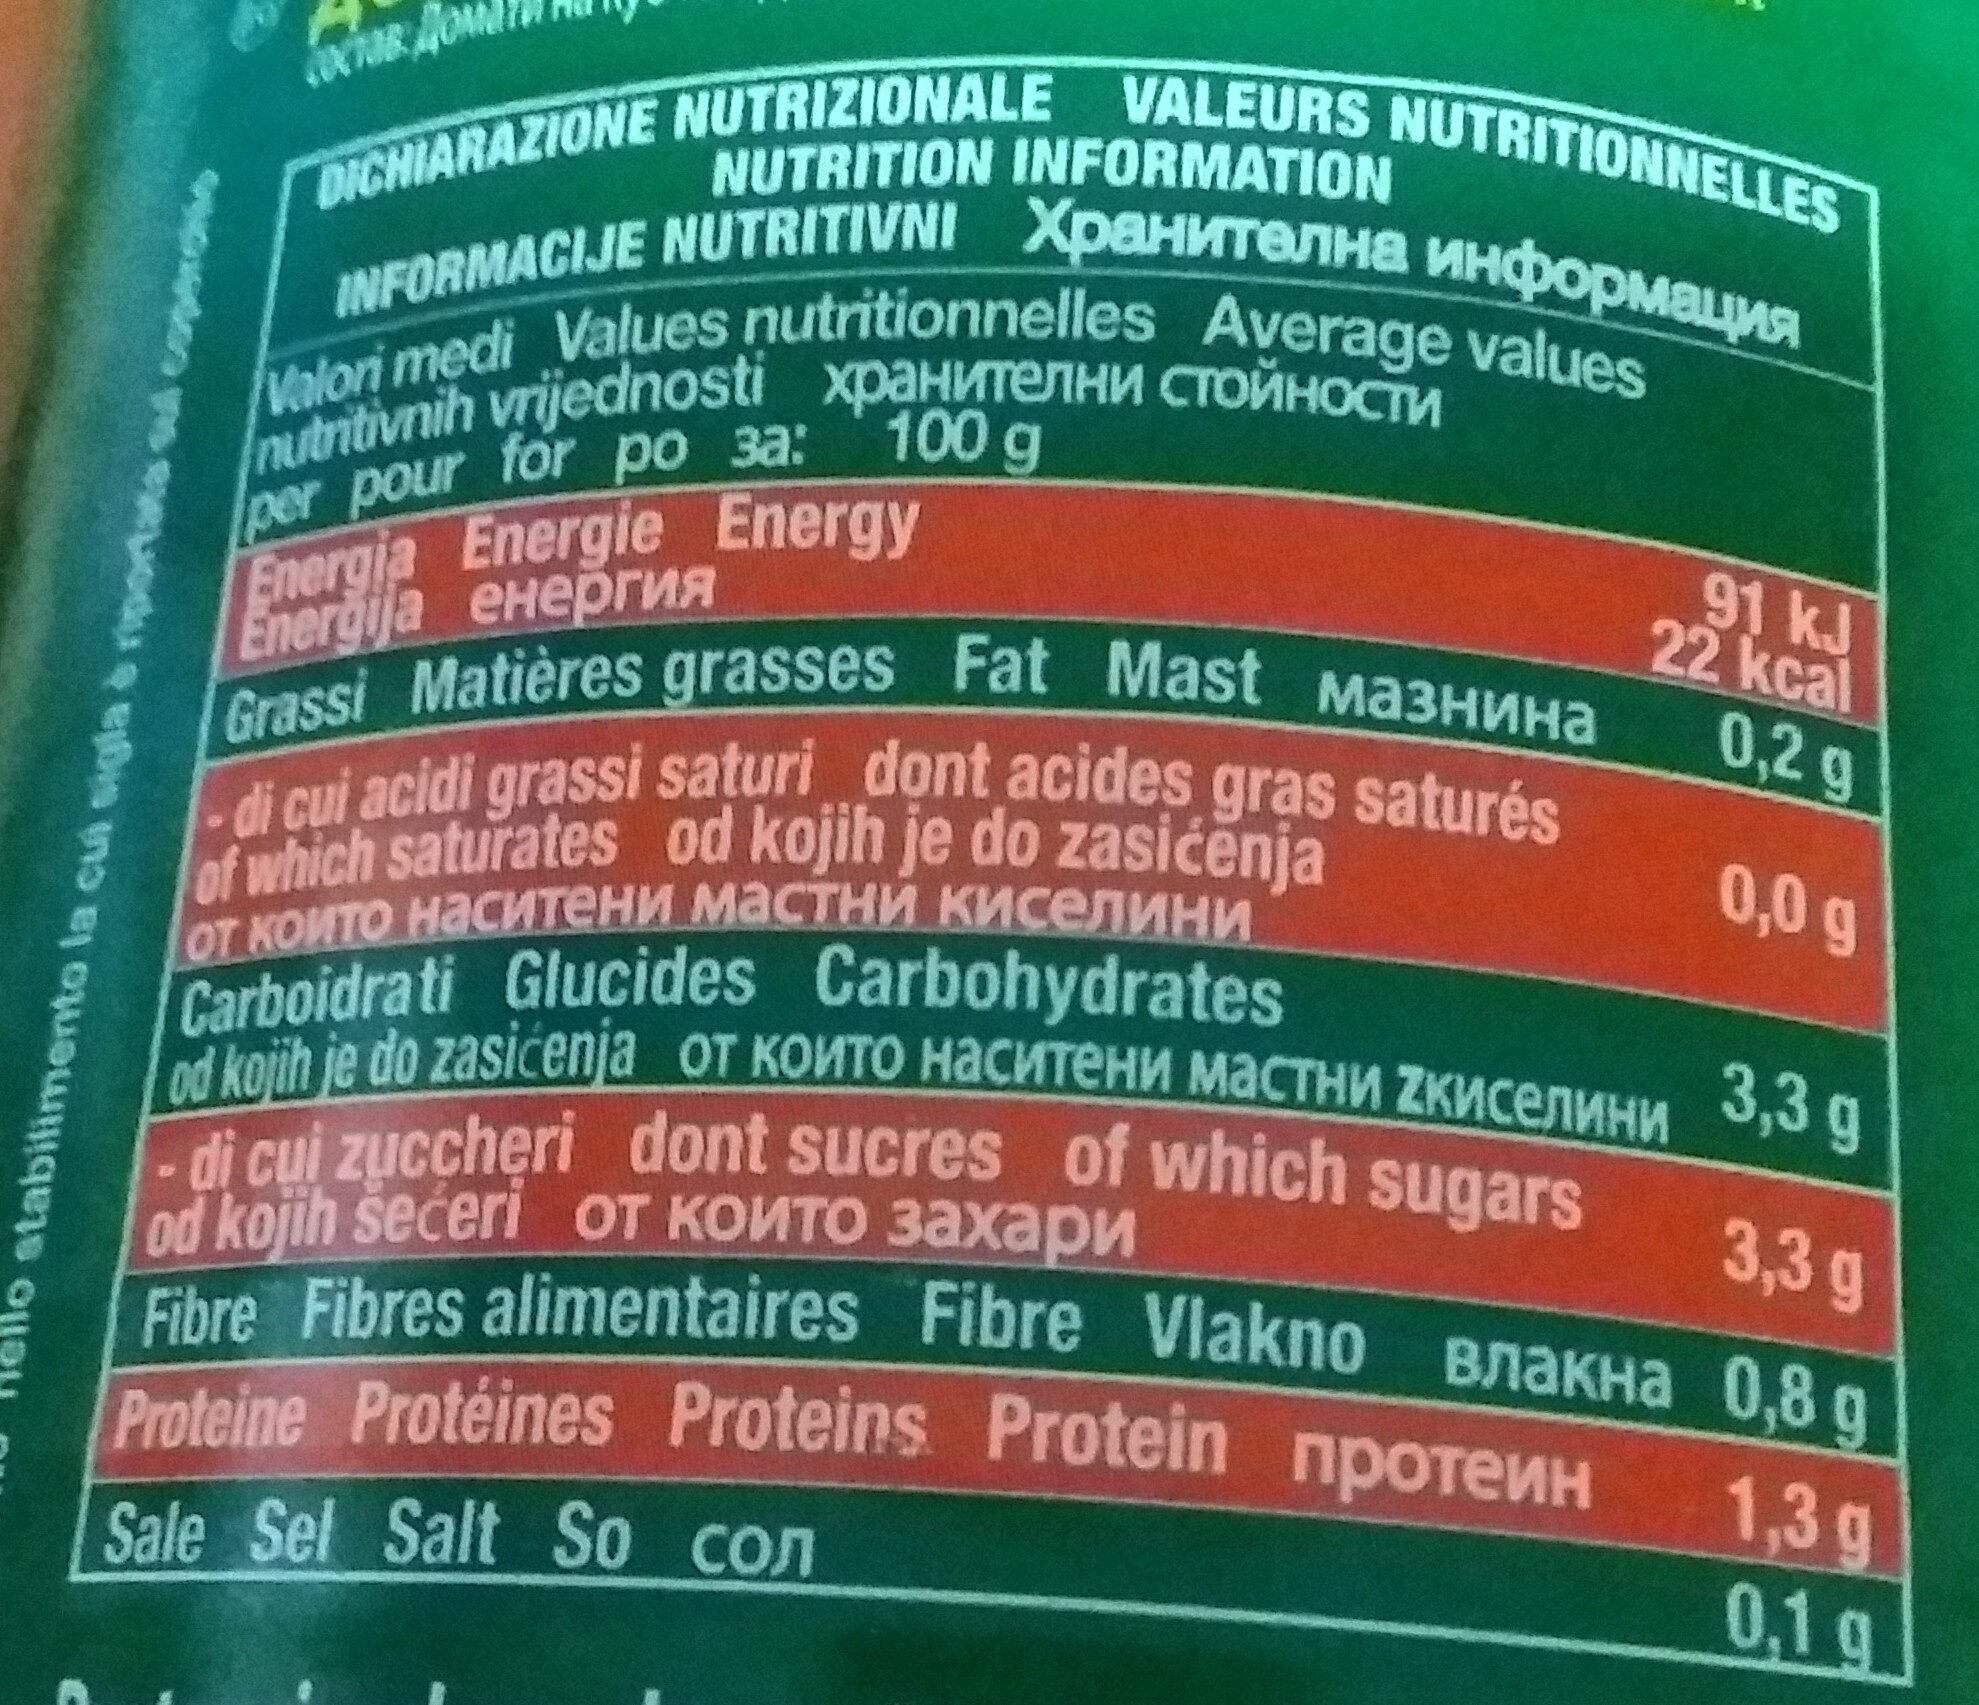 VESU polpa di pomodoro - Ingredients